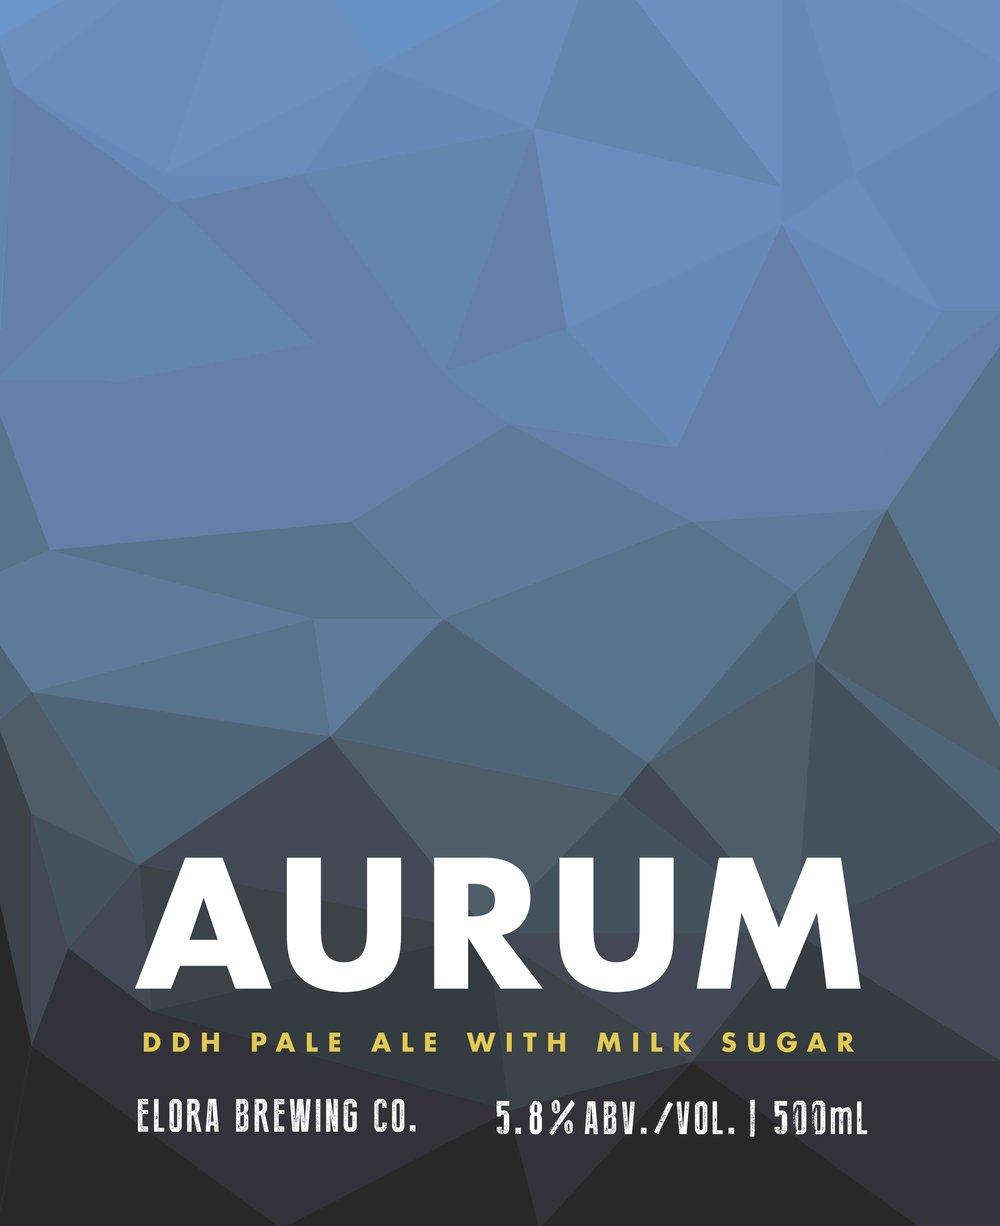 Aurum_bluePaleAle.jpg